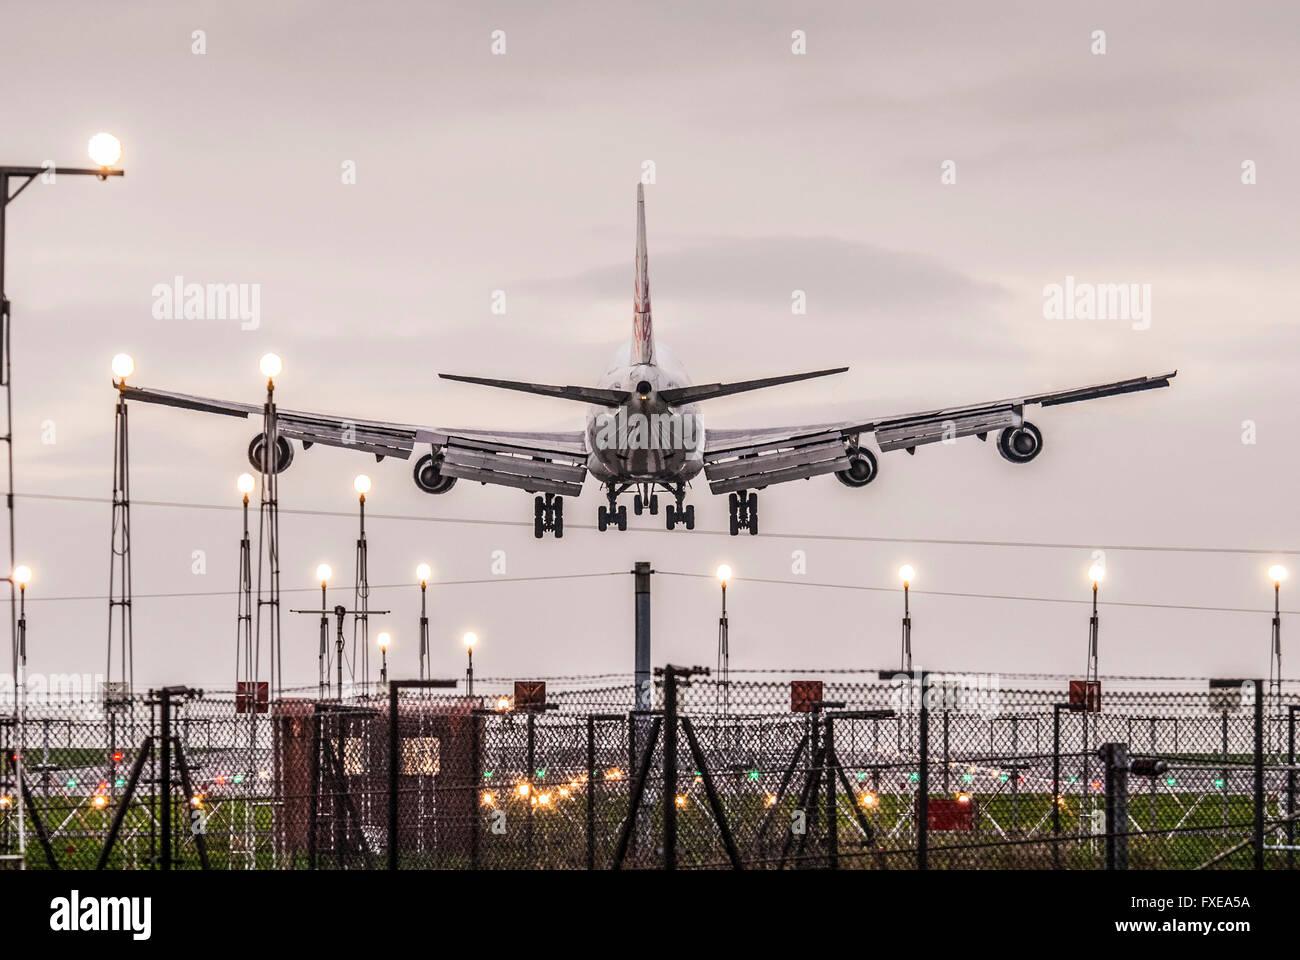 Boeing 747 jumbo jet landing. evening. - Stock Image